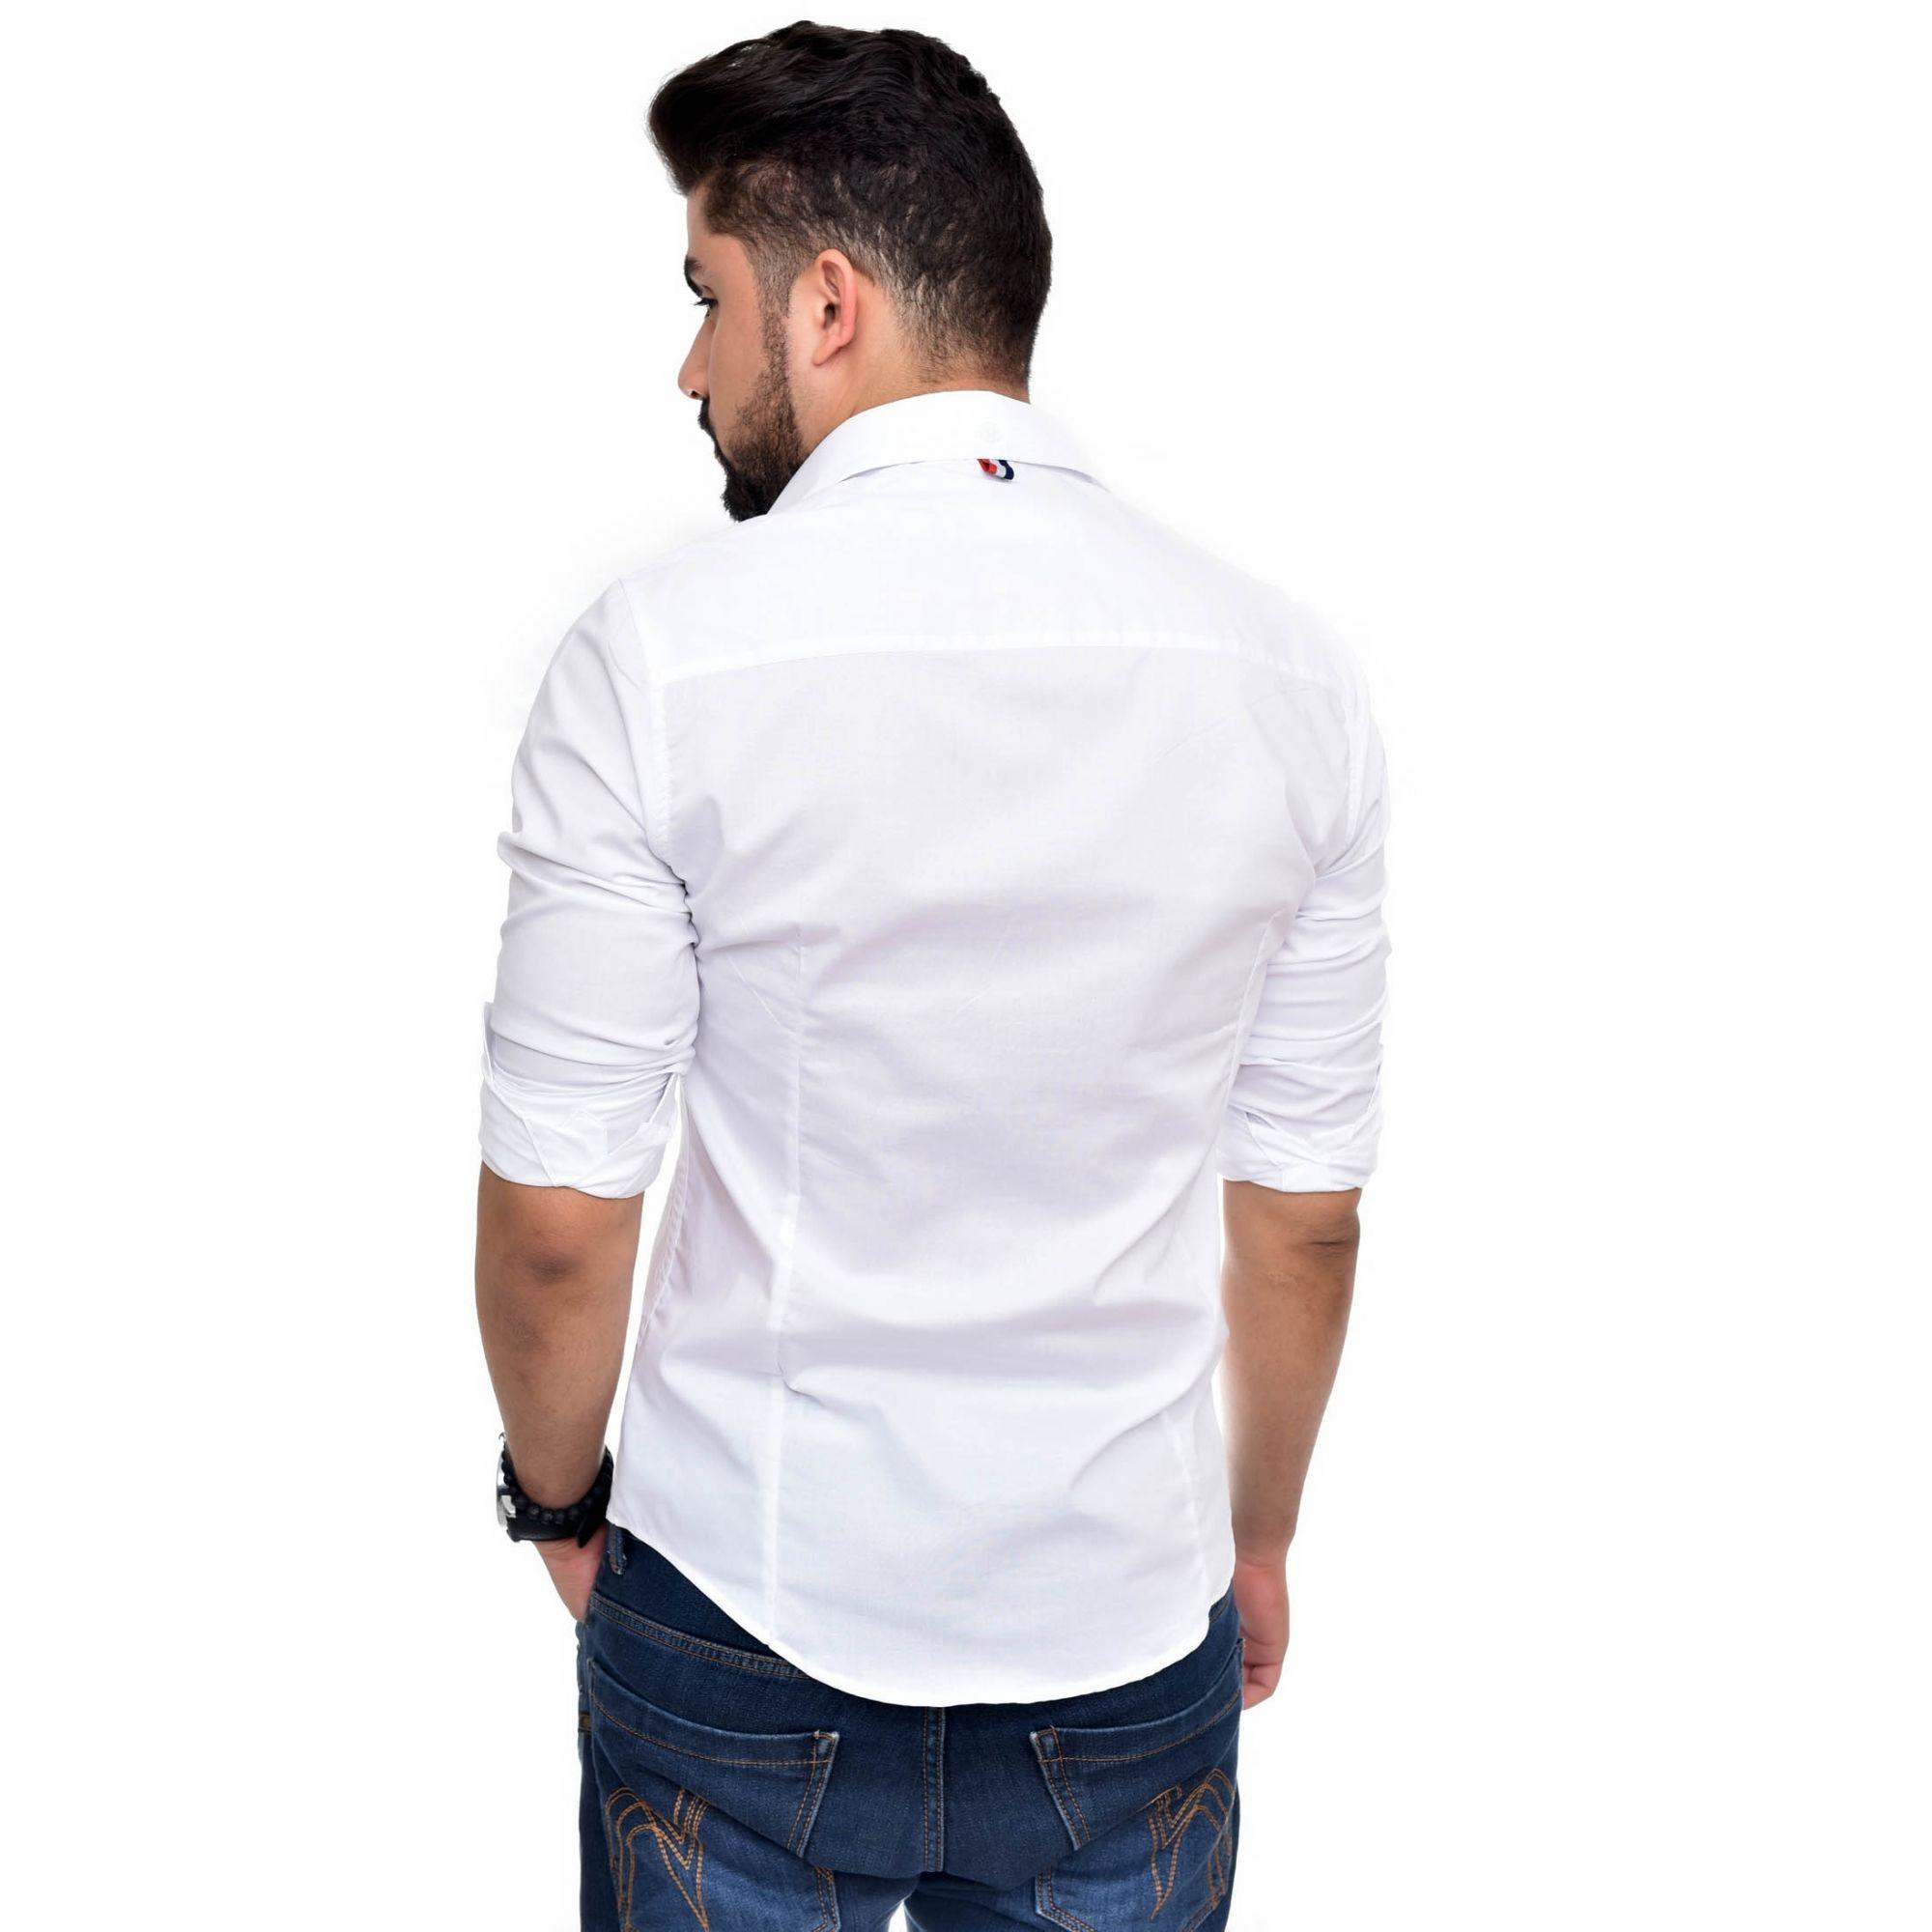 Camisa Social SK Style Branca  - Ca Brasileira